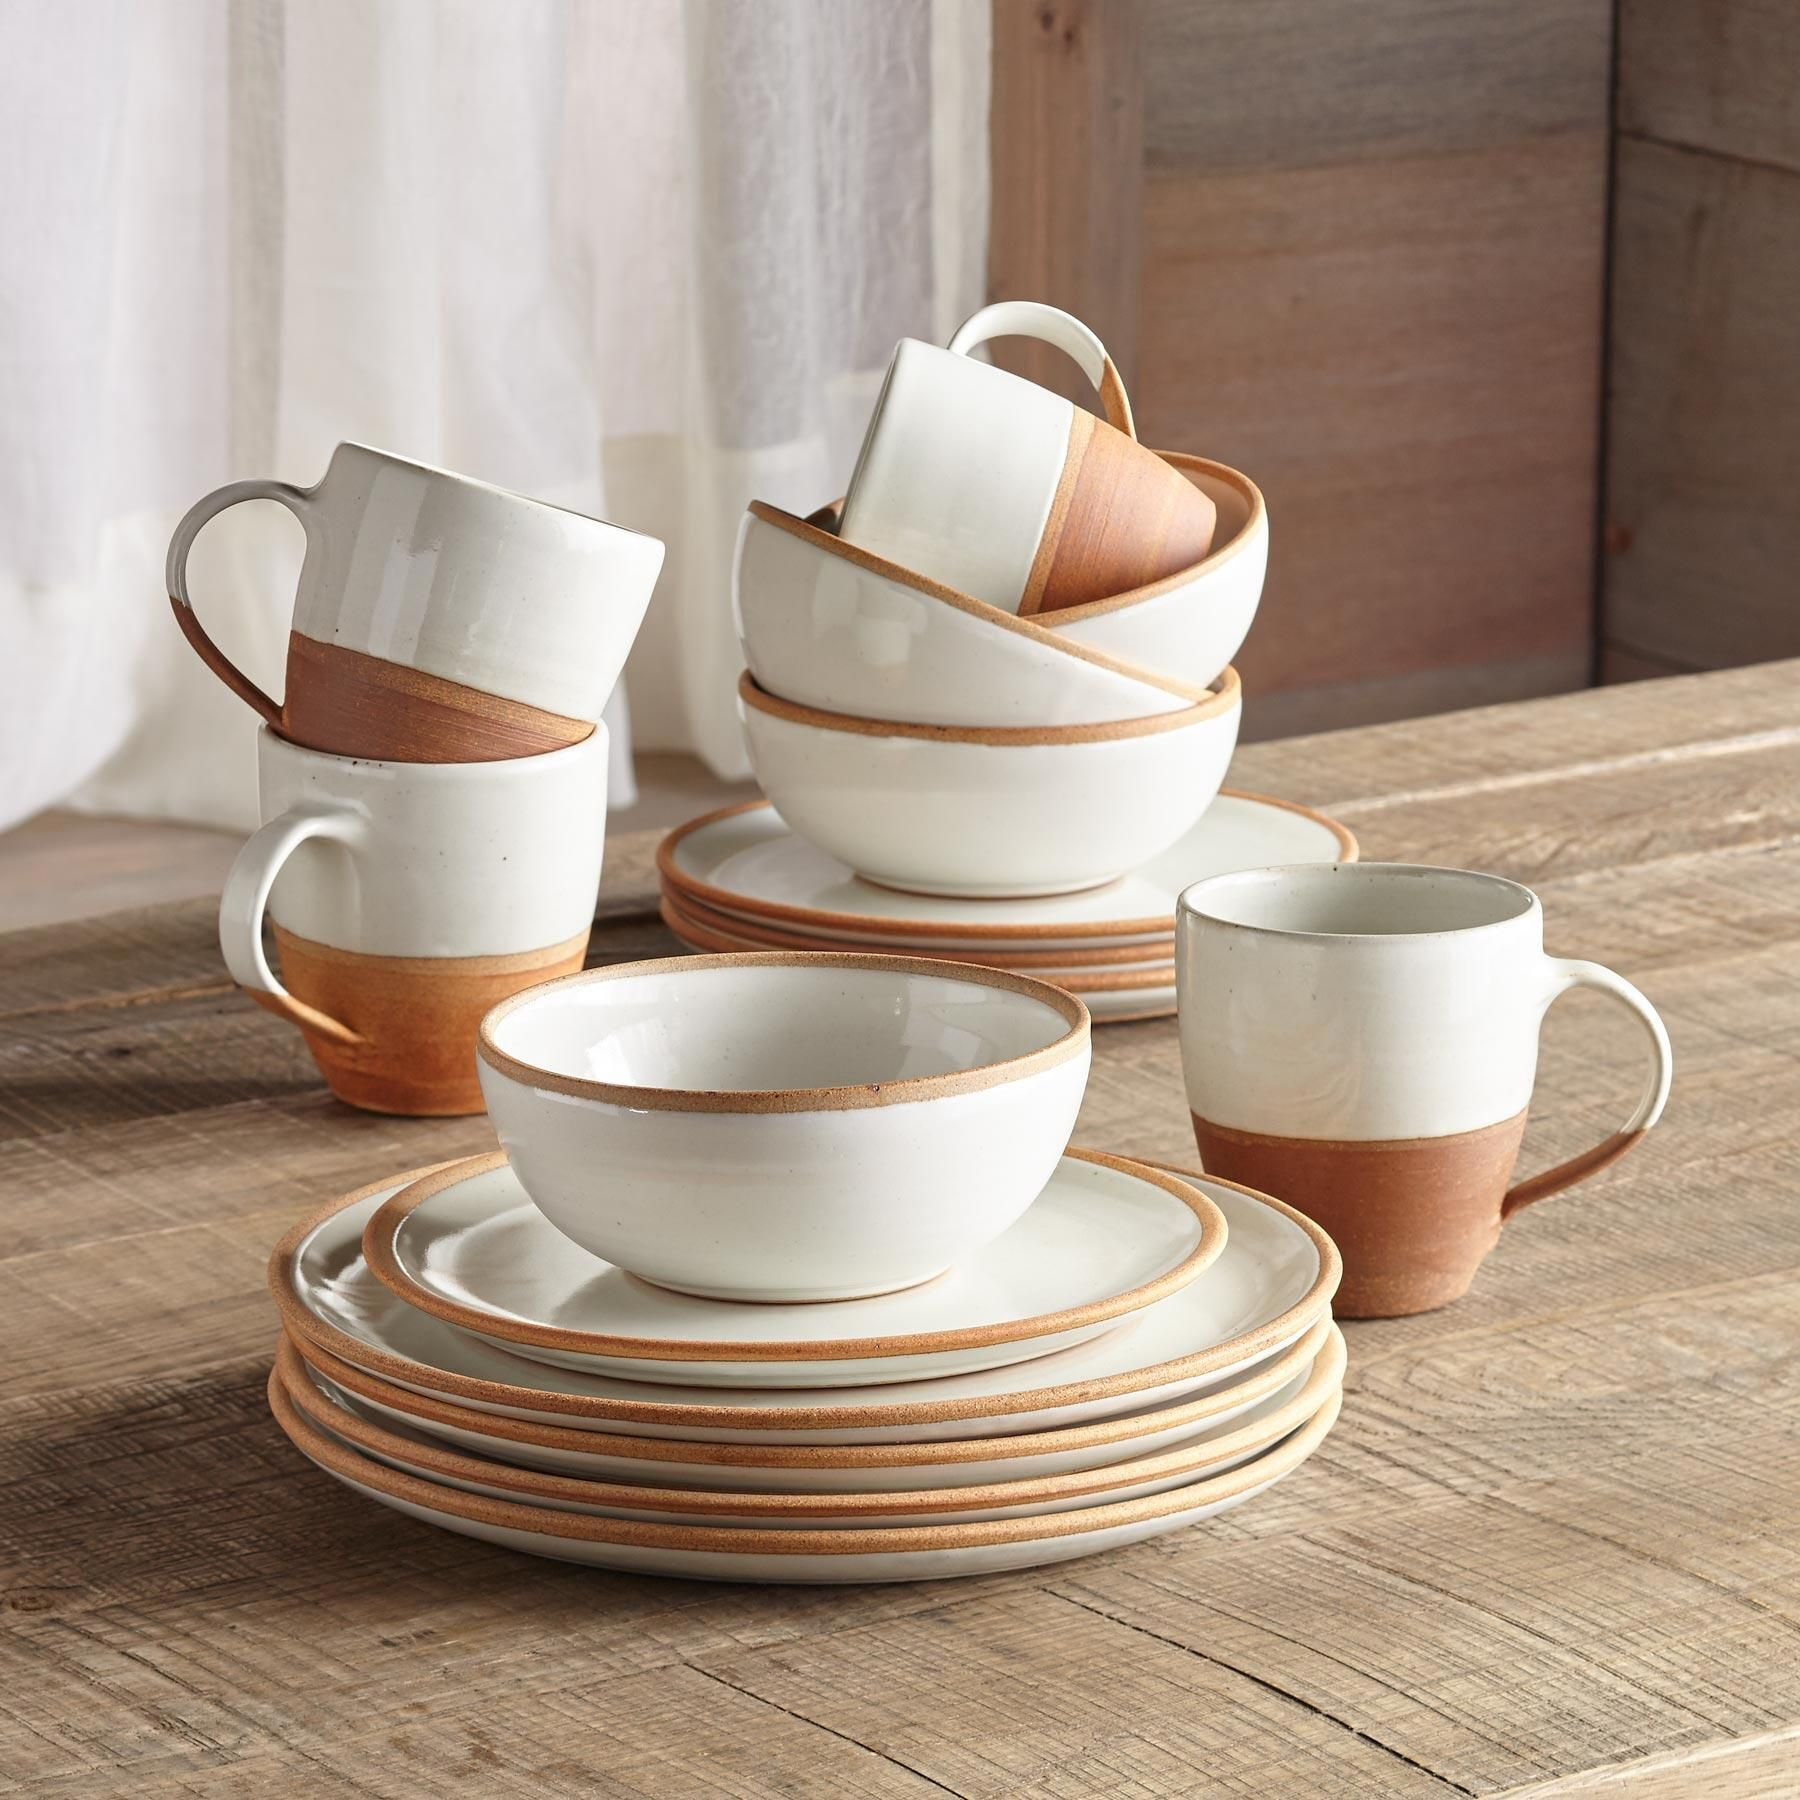 Terra Dinnerware 16 Piece Set Ceramic Dinnerware Set Handmade Dinnerware Ceramic Dinnerware